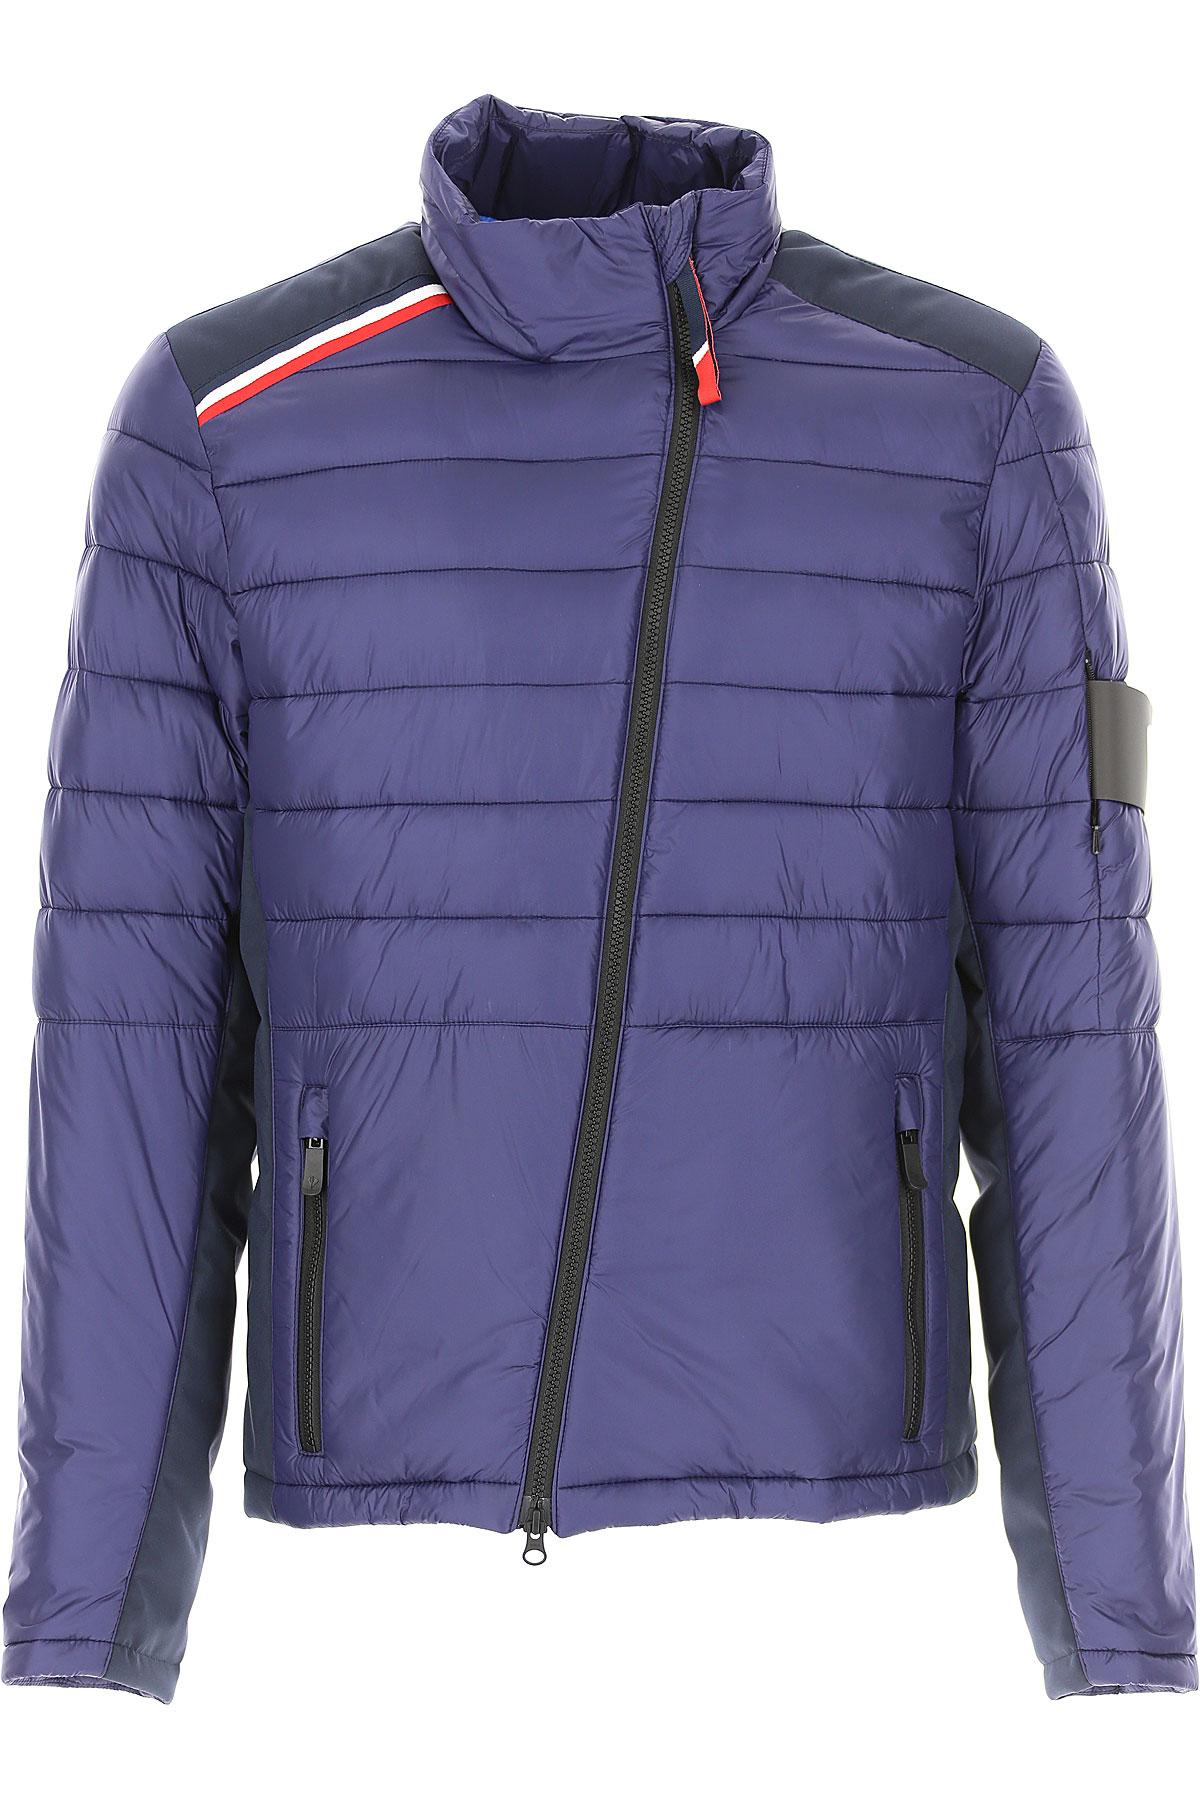 Rossignol Mens Clothing On Sale, Royal Blue, polyamide, 2019, M S XL